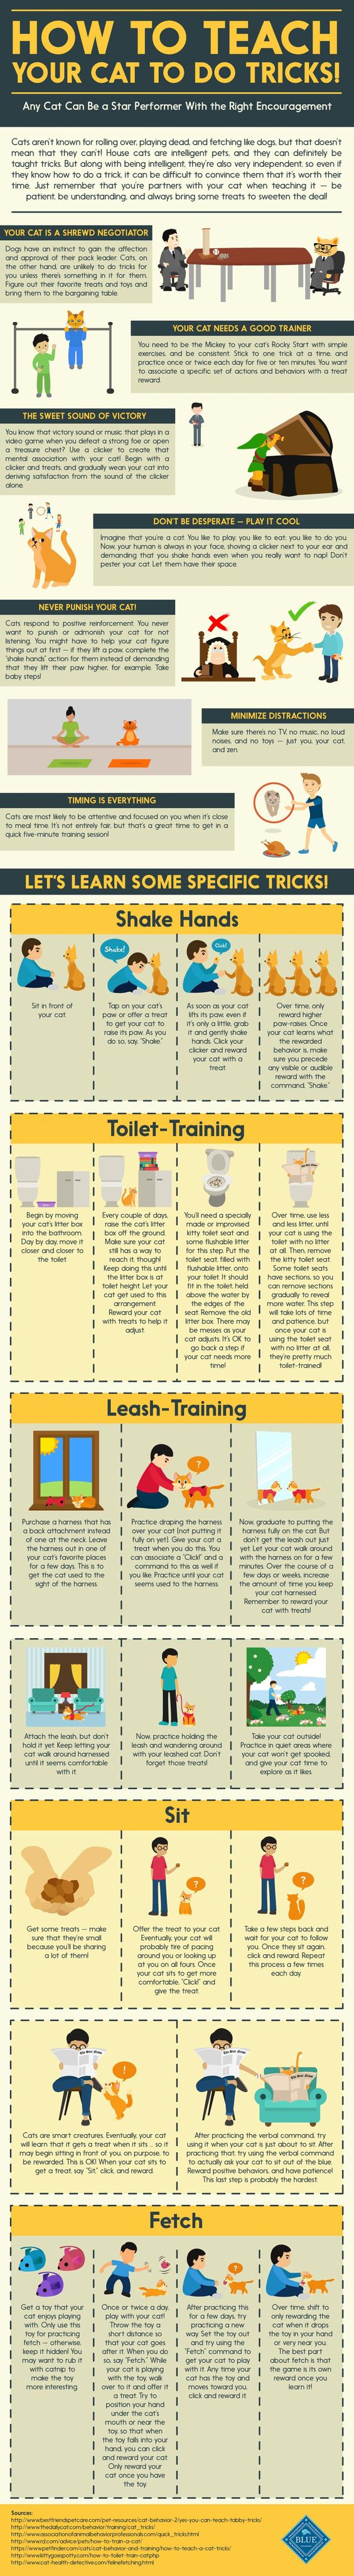 Leash training steps. How to Teach Your Cat to do Tricks